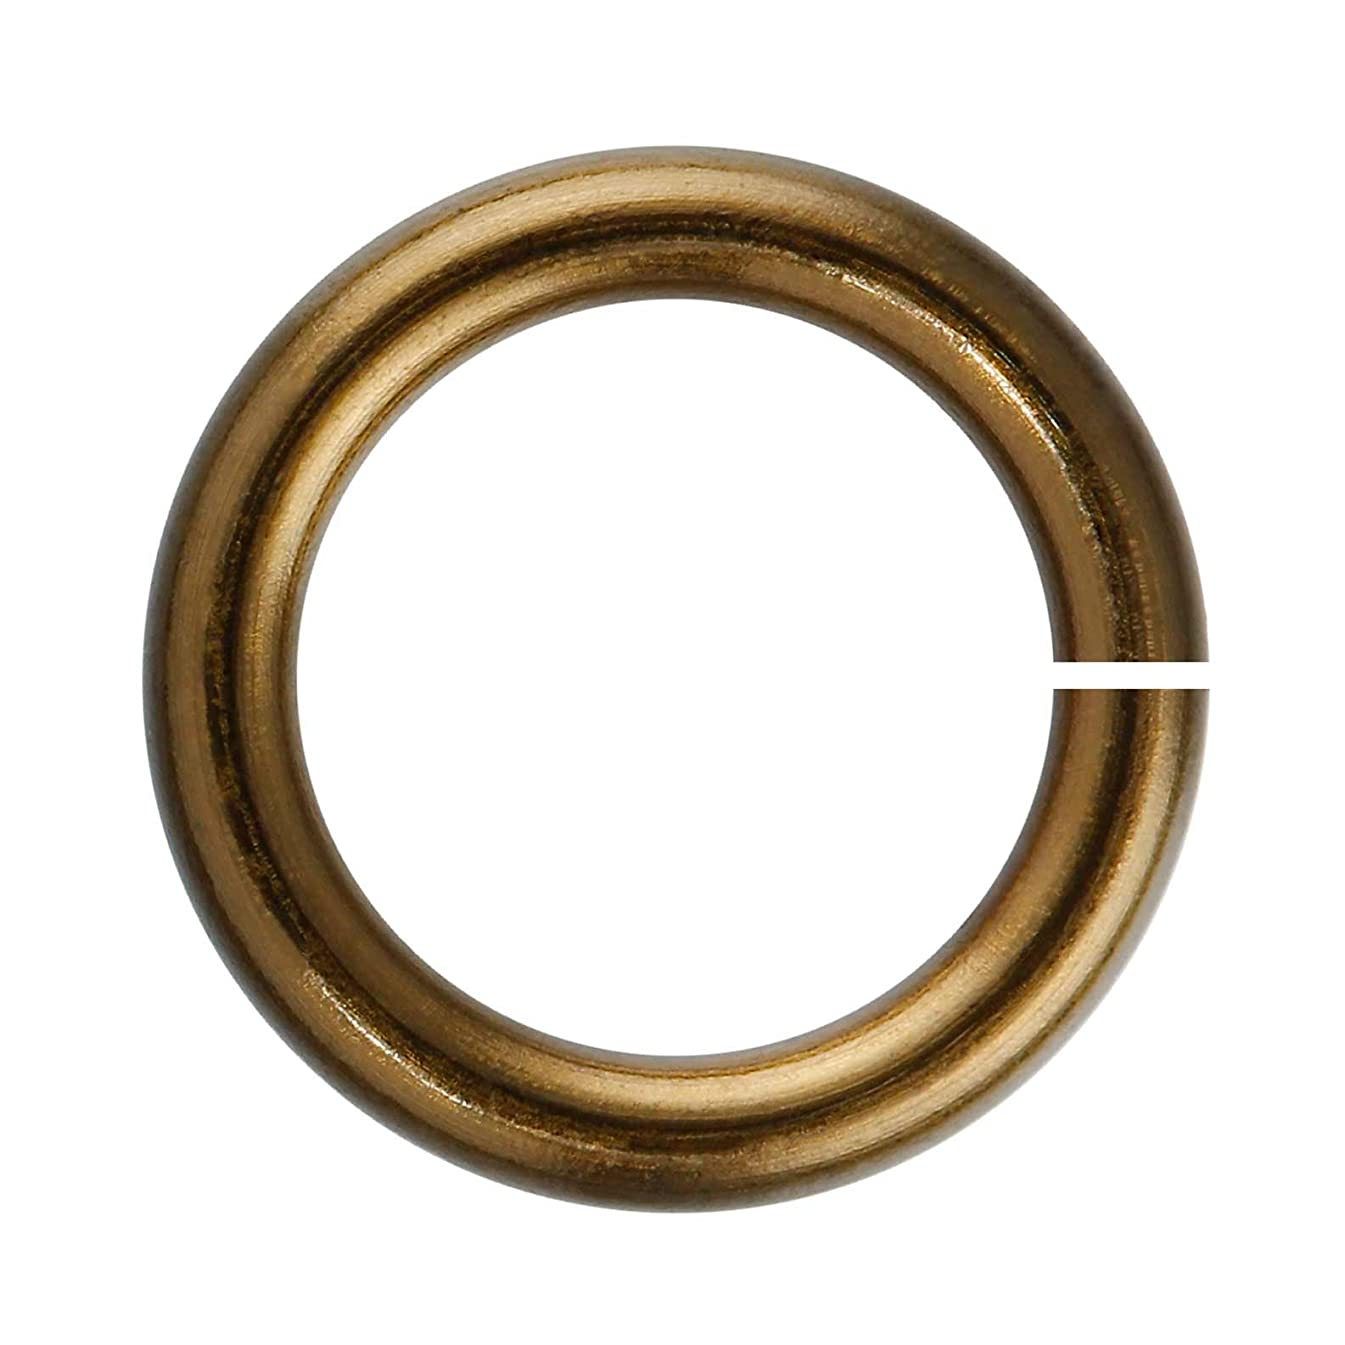 18-Gauge 5.5mm Vintage Bronze Enameled Copper Jump Rings - 1 ounce